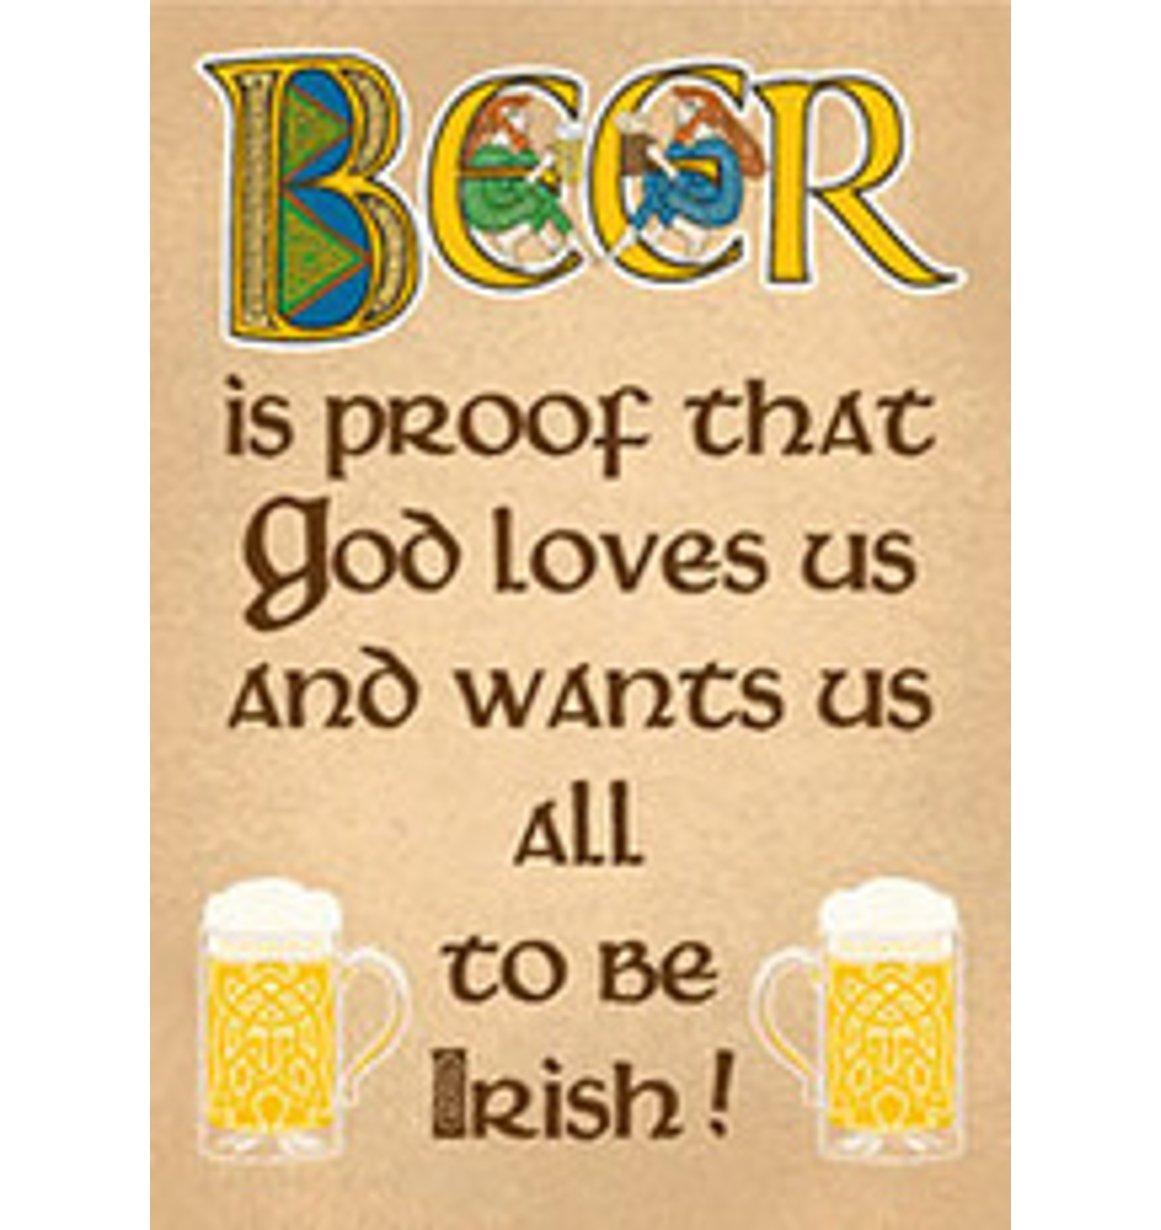 Witty Beer is Proof Irish Refrigerator Magnet